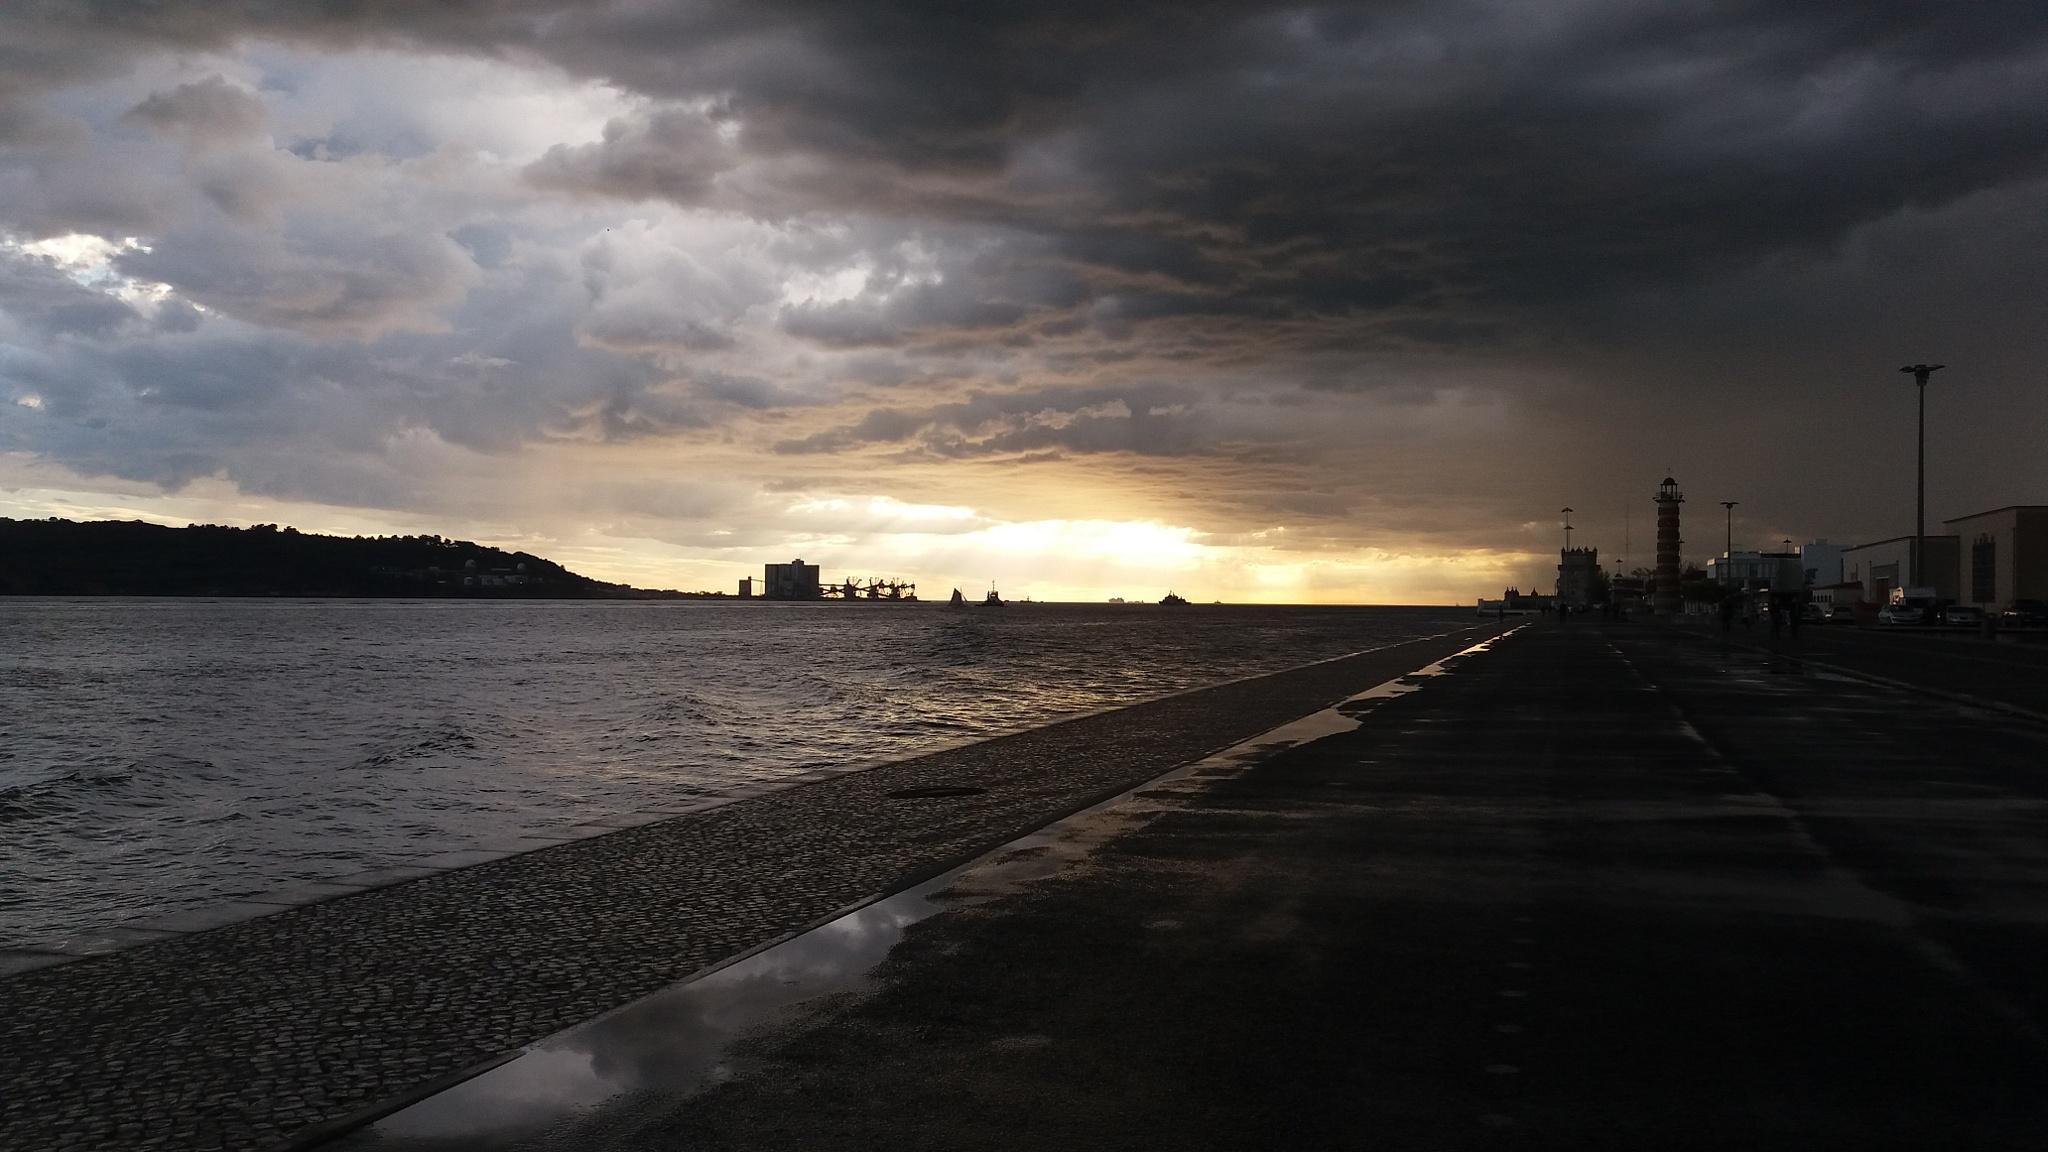 Weather change at late arvo by Nea Lo